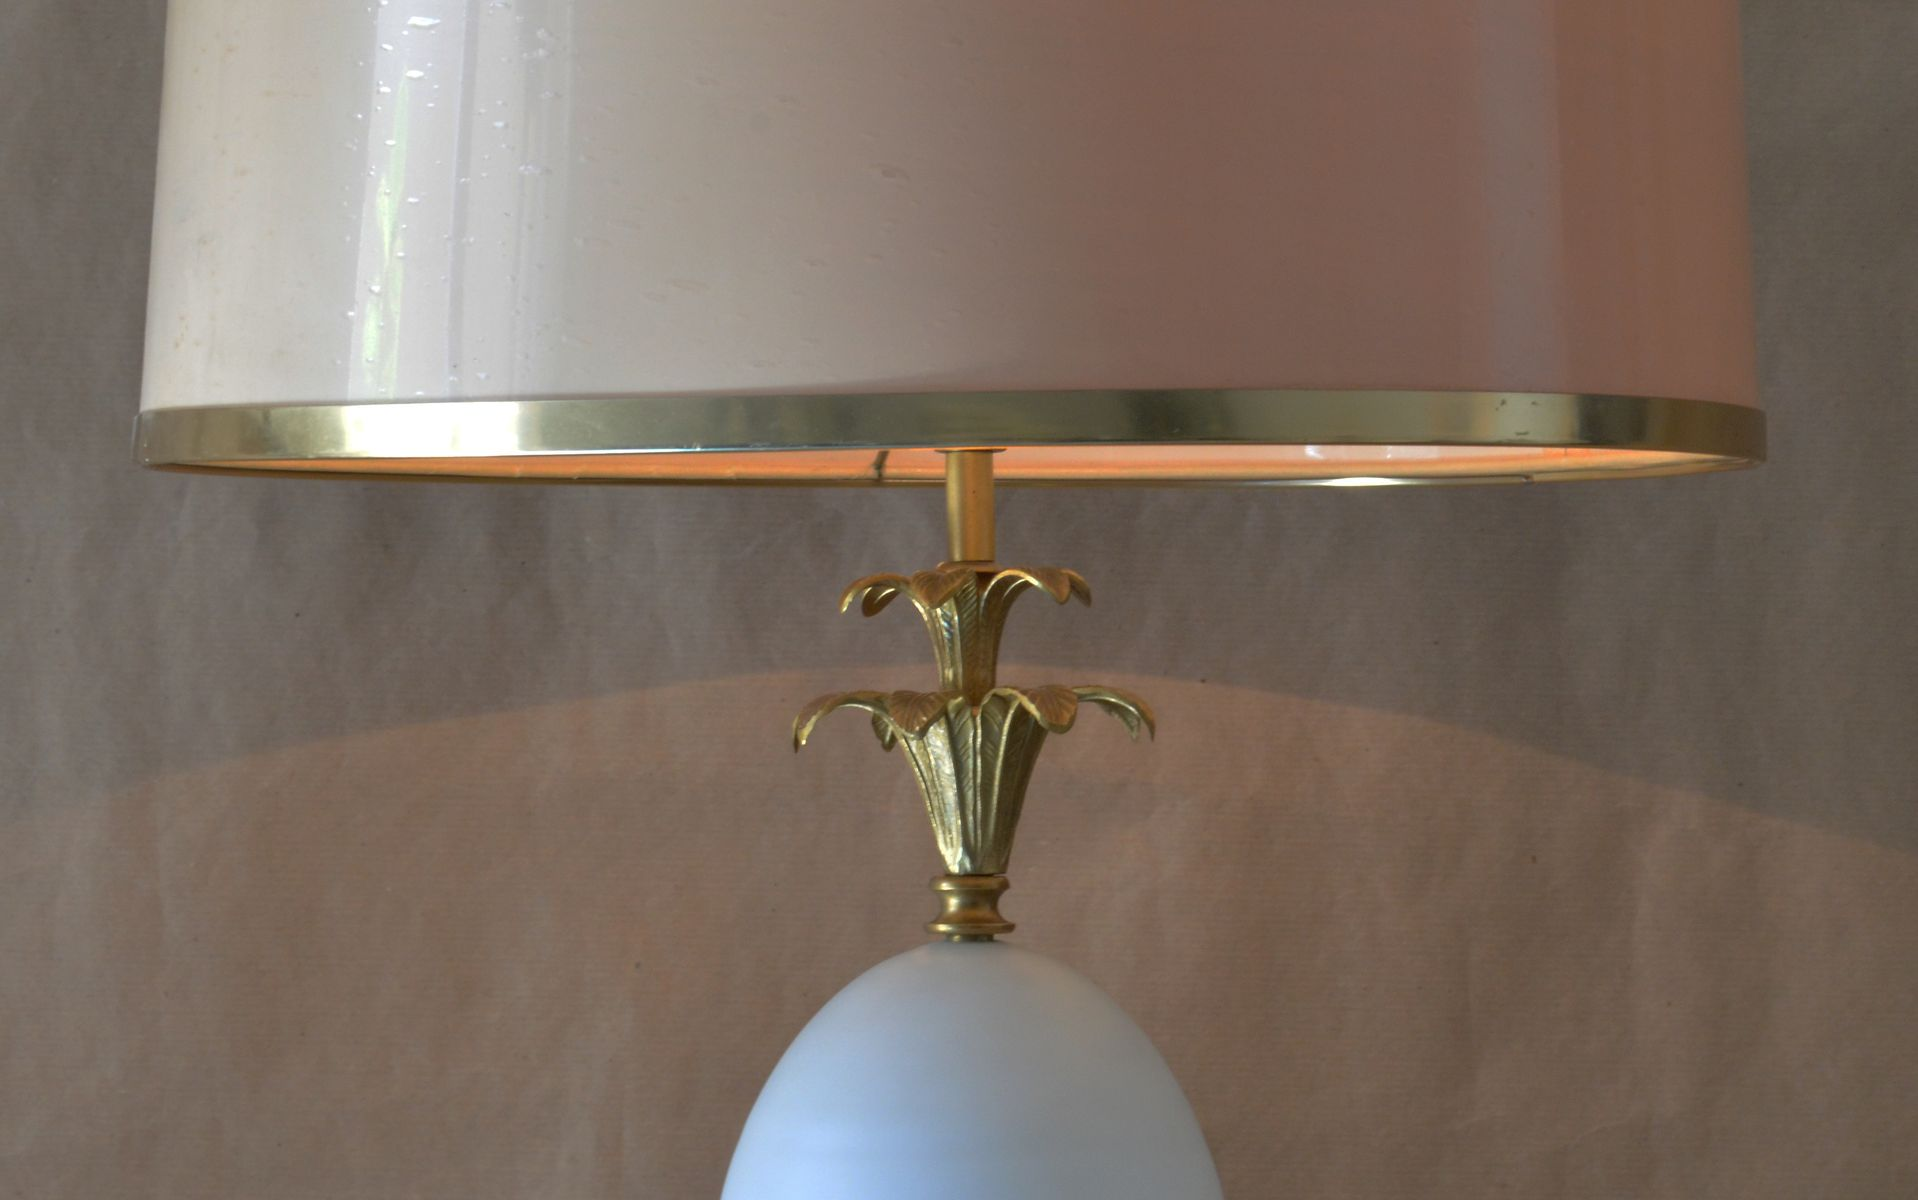 lamp table pin lamps pineapple shiny ceramic